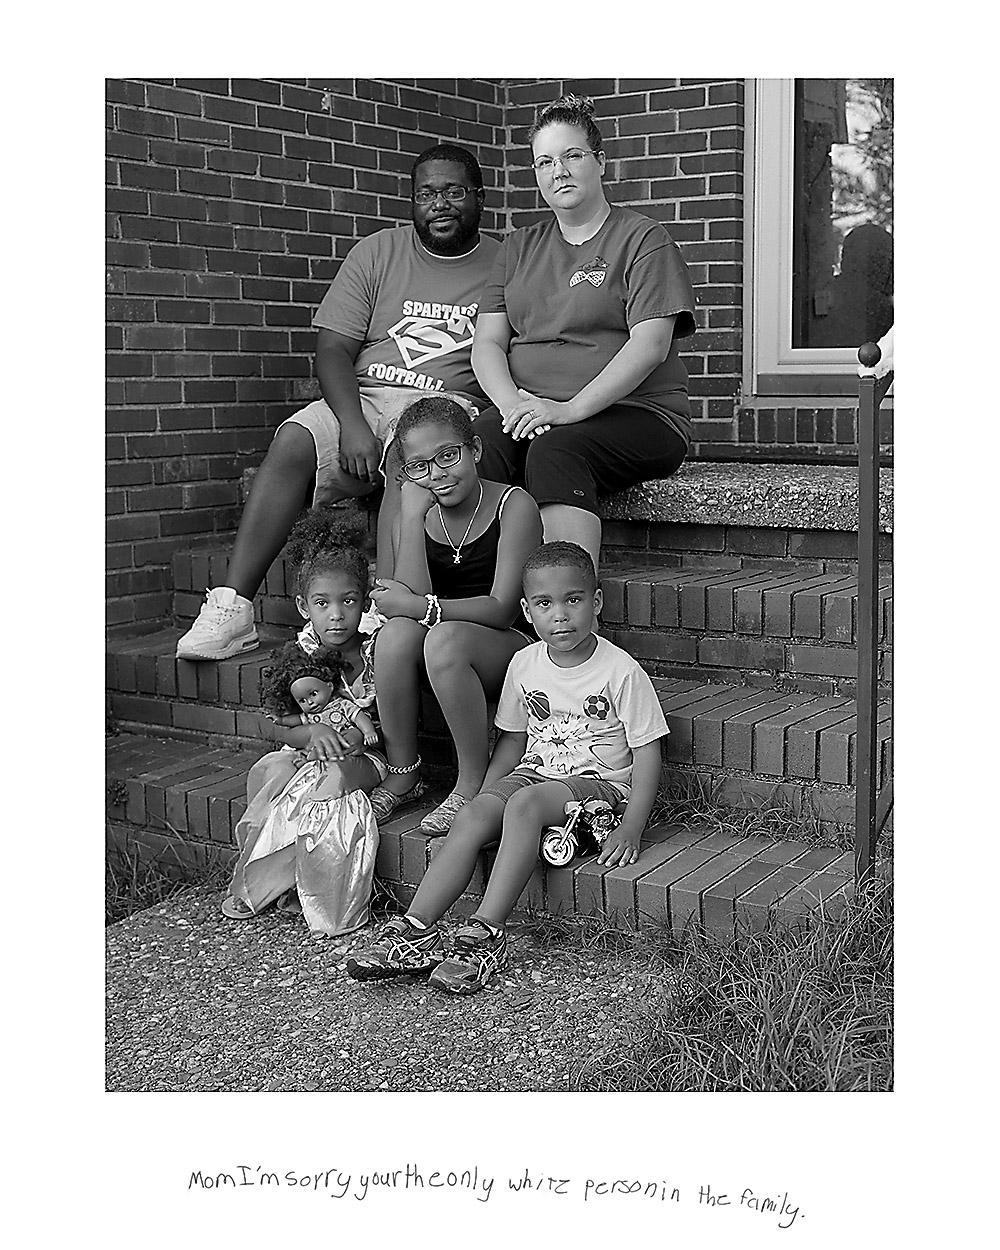 ©PinckleyD–MomImsorryyourtheonlywhitzpersoninthefamily